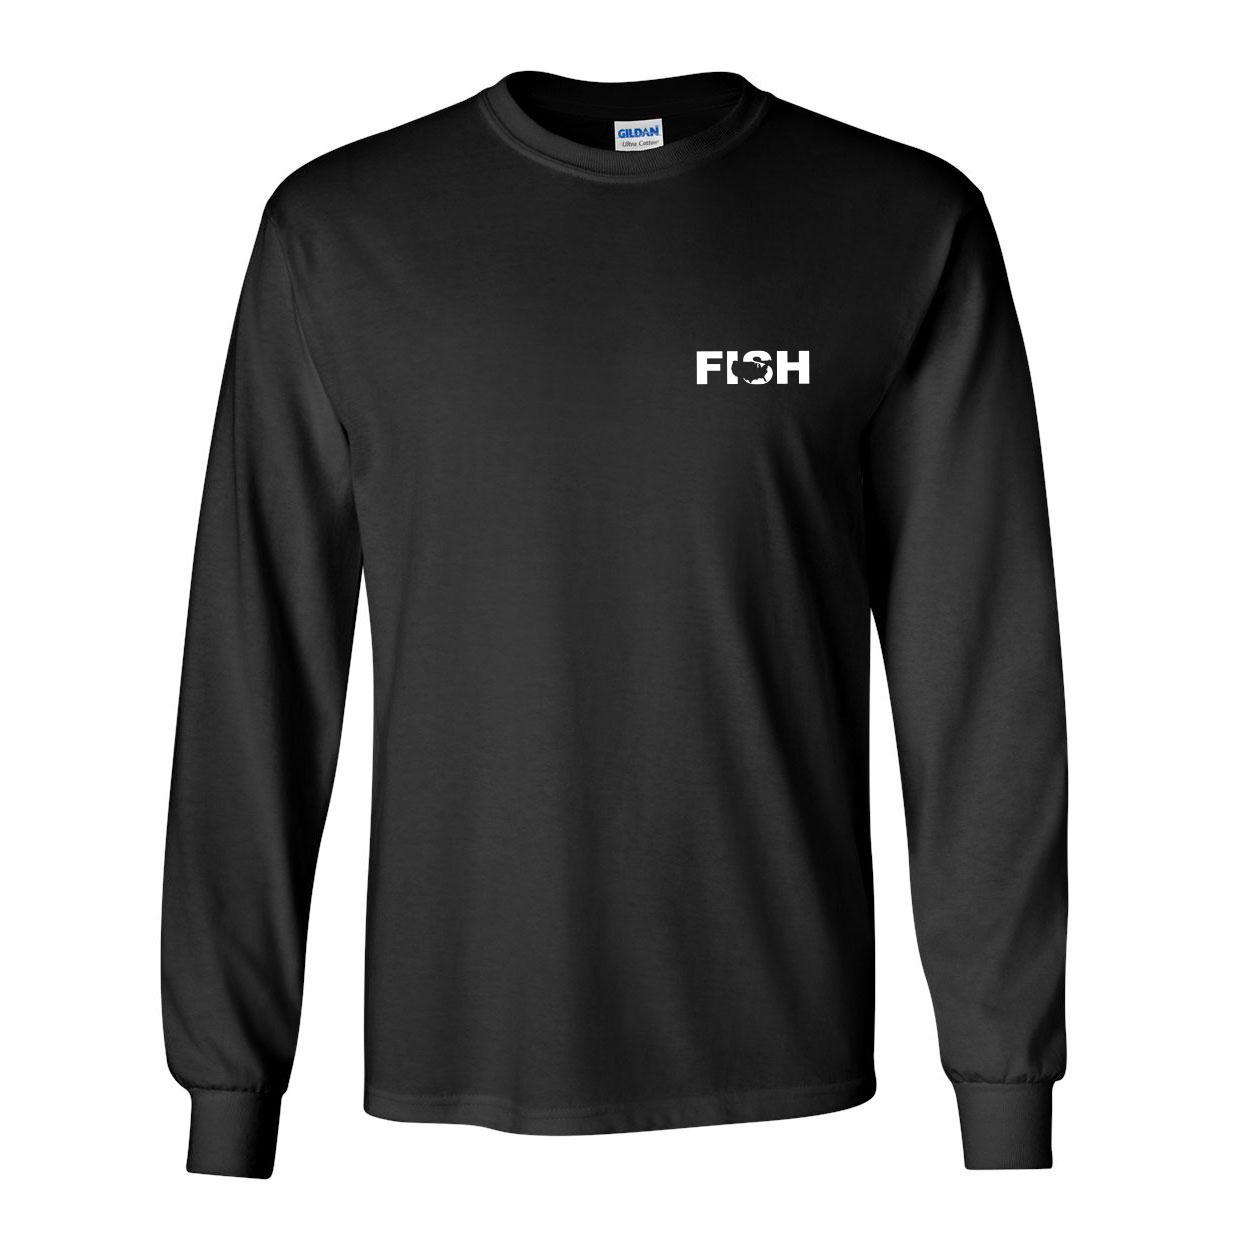 Fish United States Night Out Long Sleeve T-Shirt Black (White Logo)